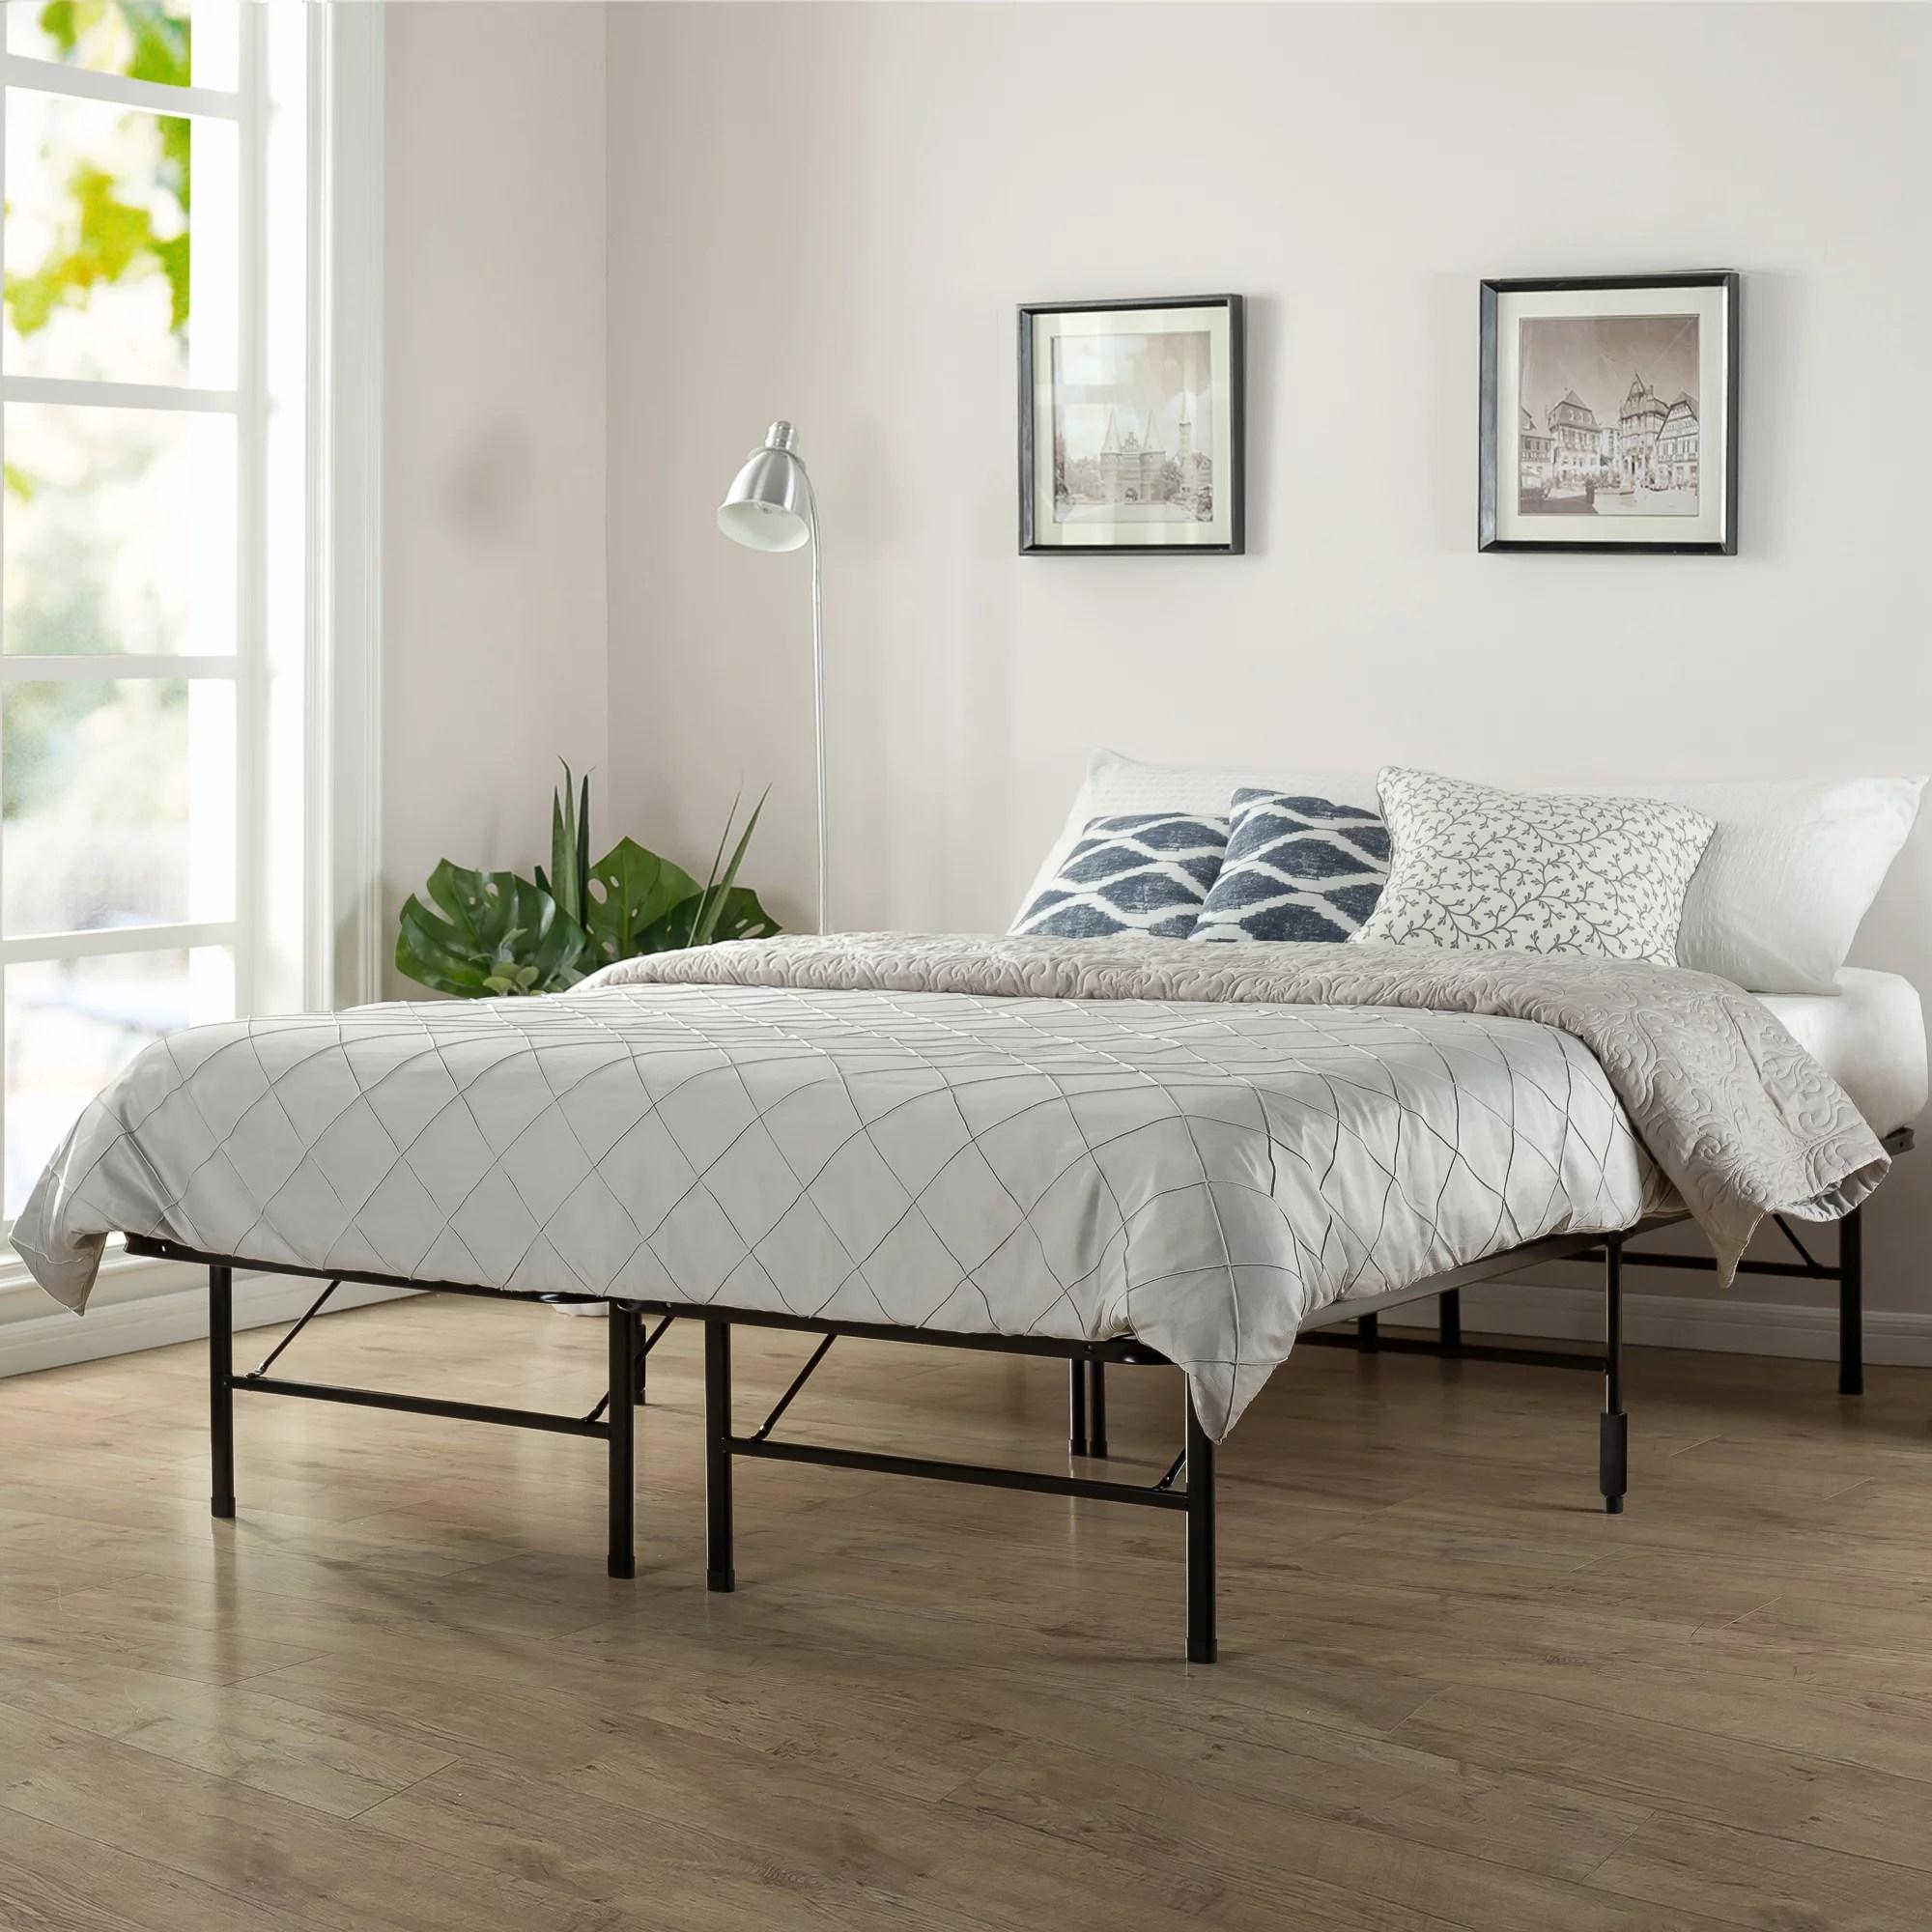 spa sensations by zinus 14 smartbase adjustable mattress foundation twin full